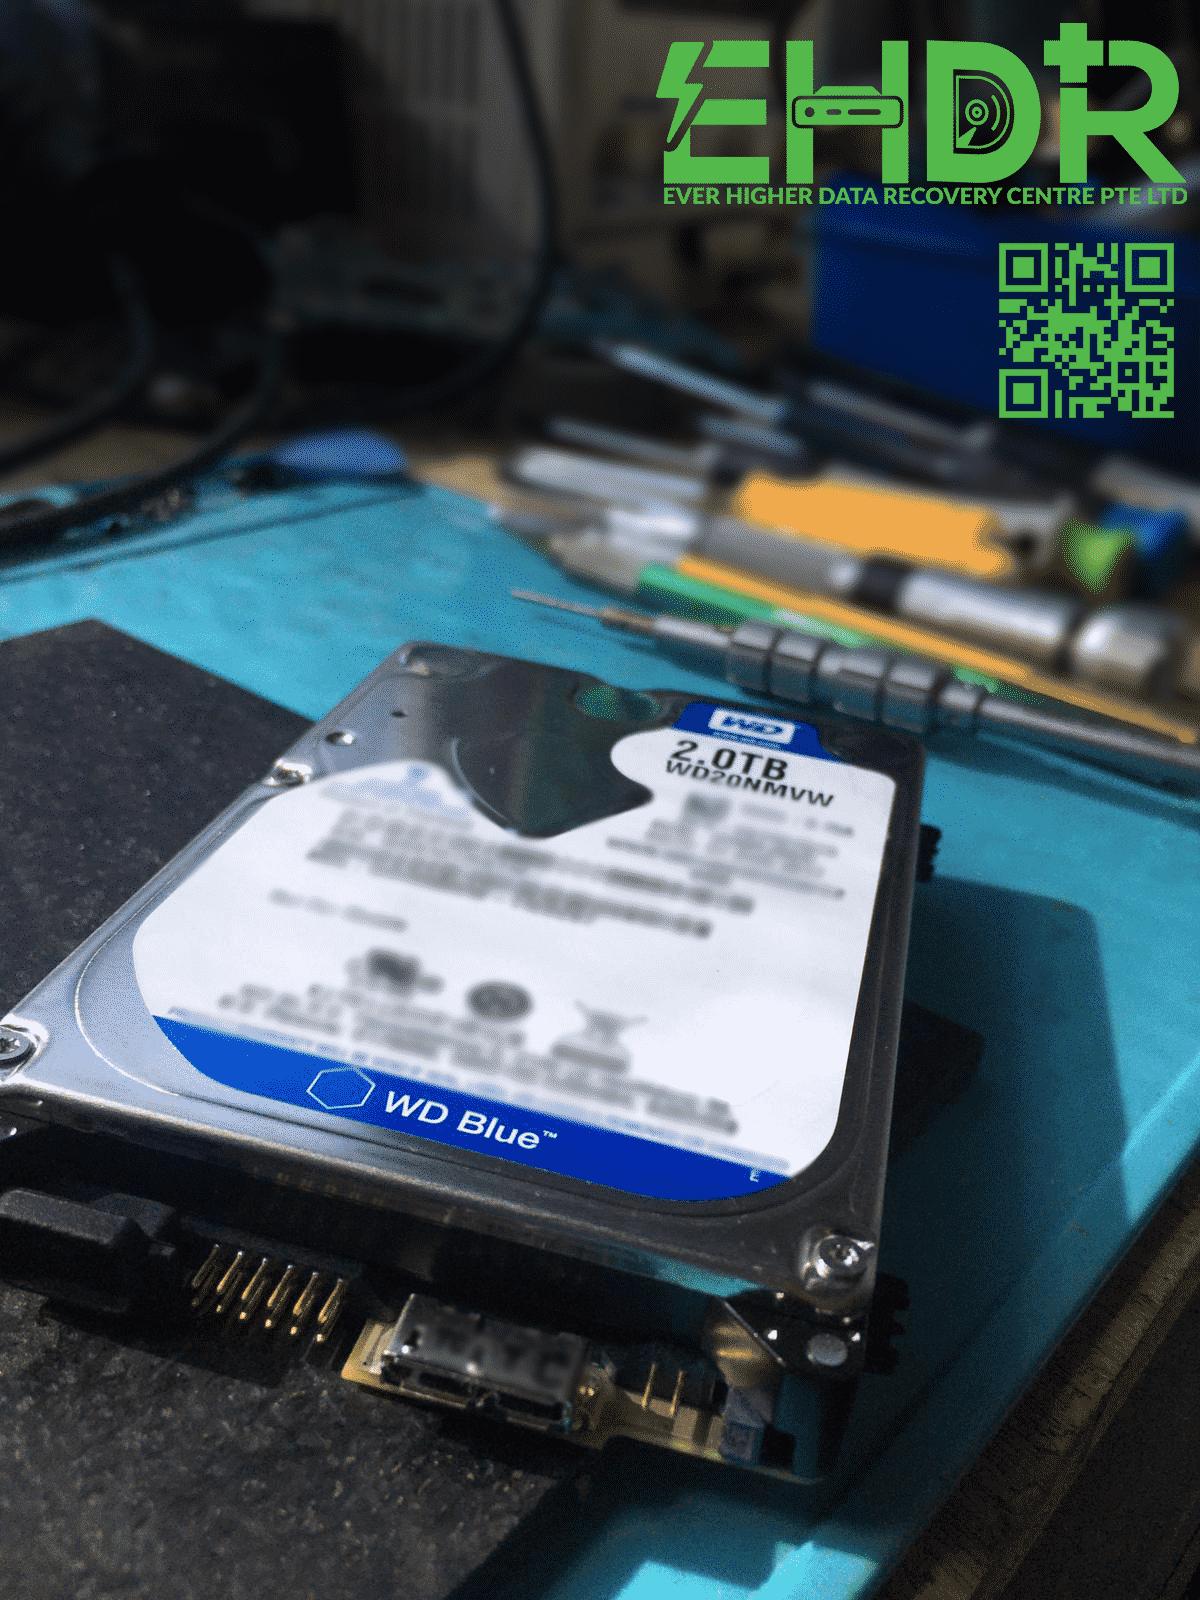 2021 June 10 – 2TB HDD